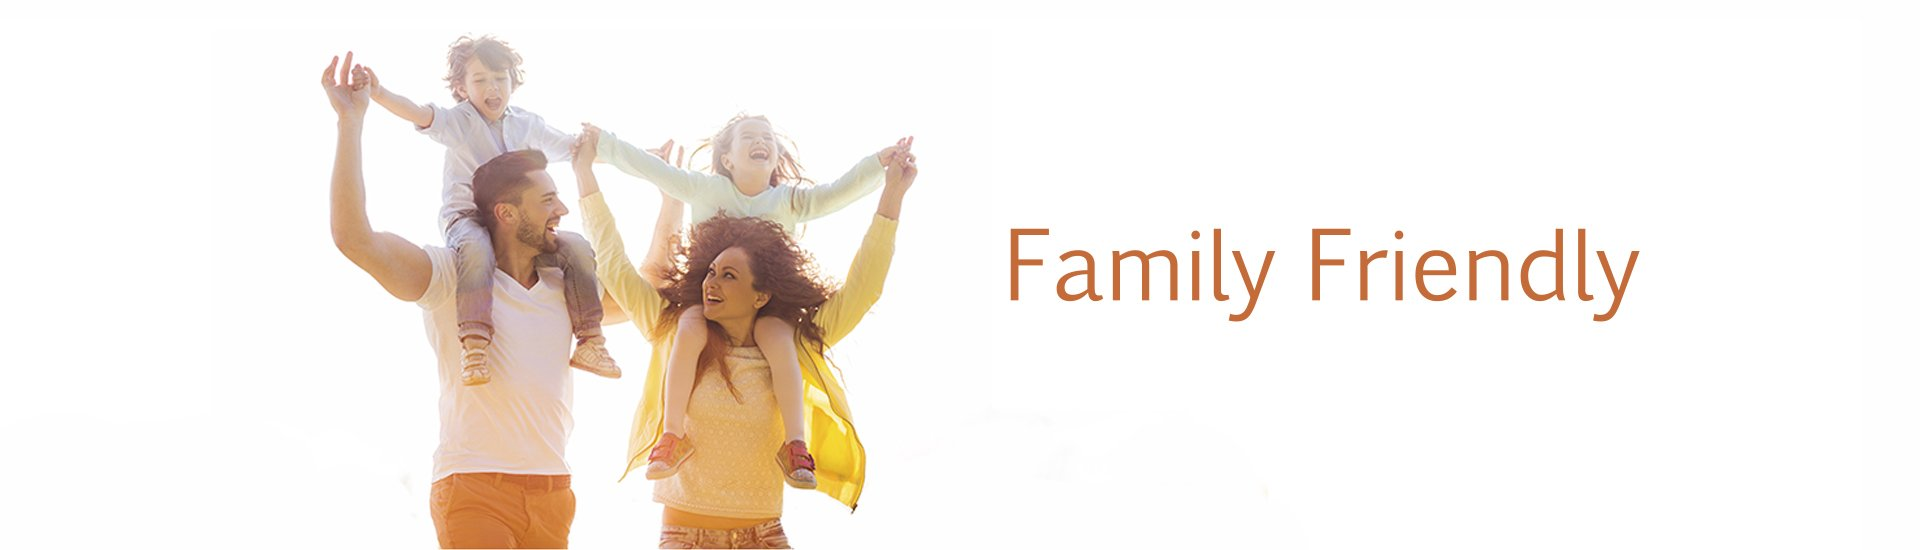 Family Friendly - Erbsville Dental Providing Dental Care for the Whole Family